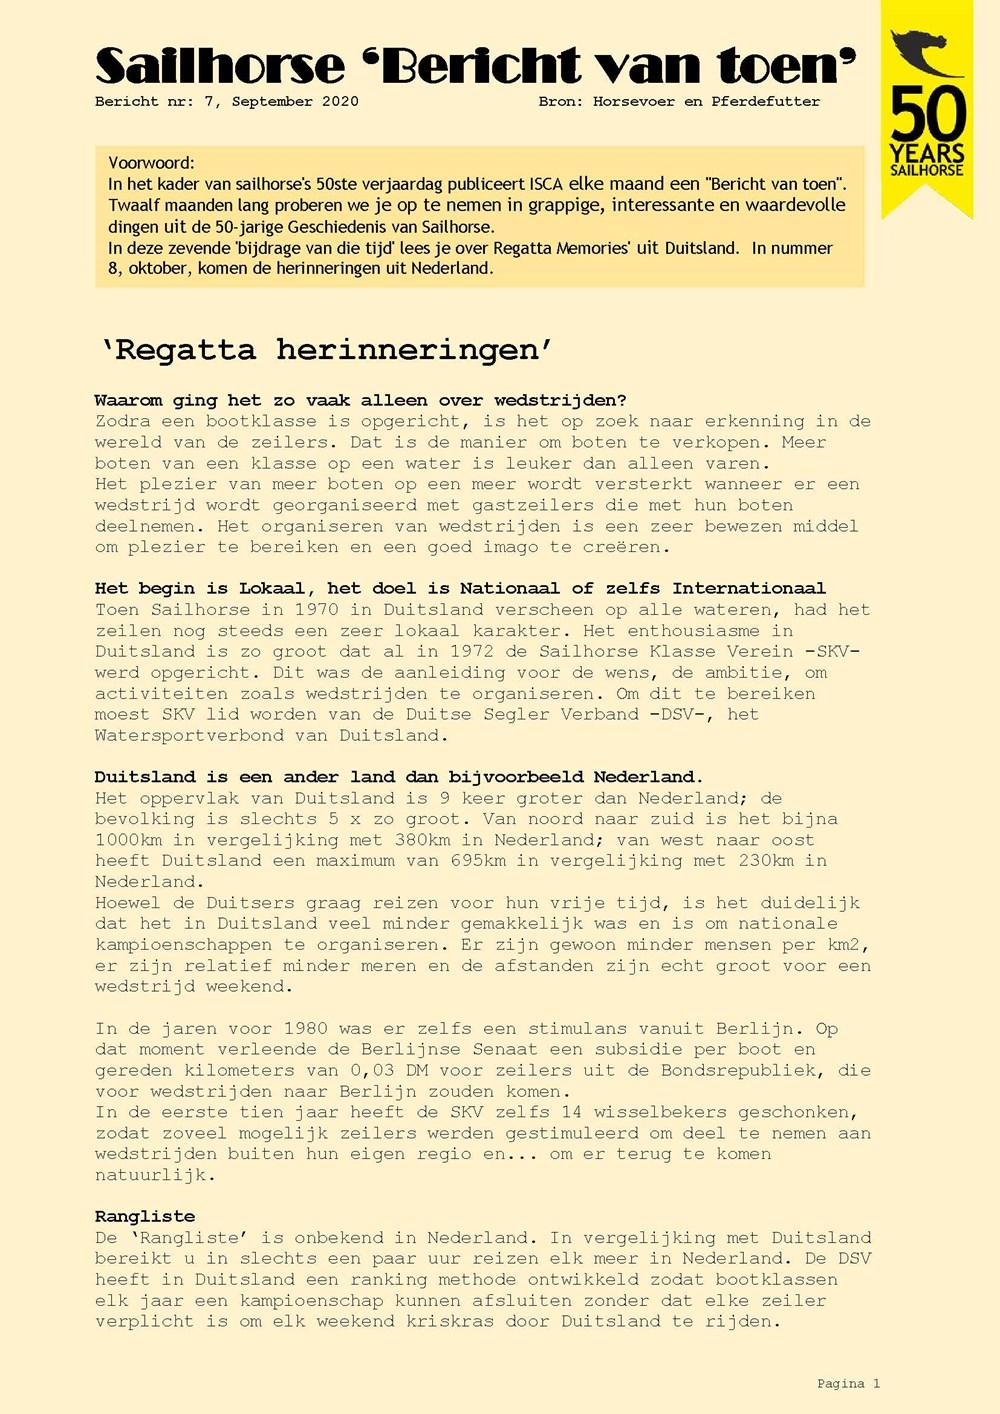 BvT7_Page_1.jpg